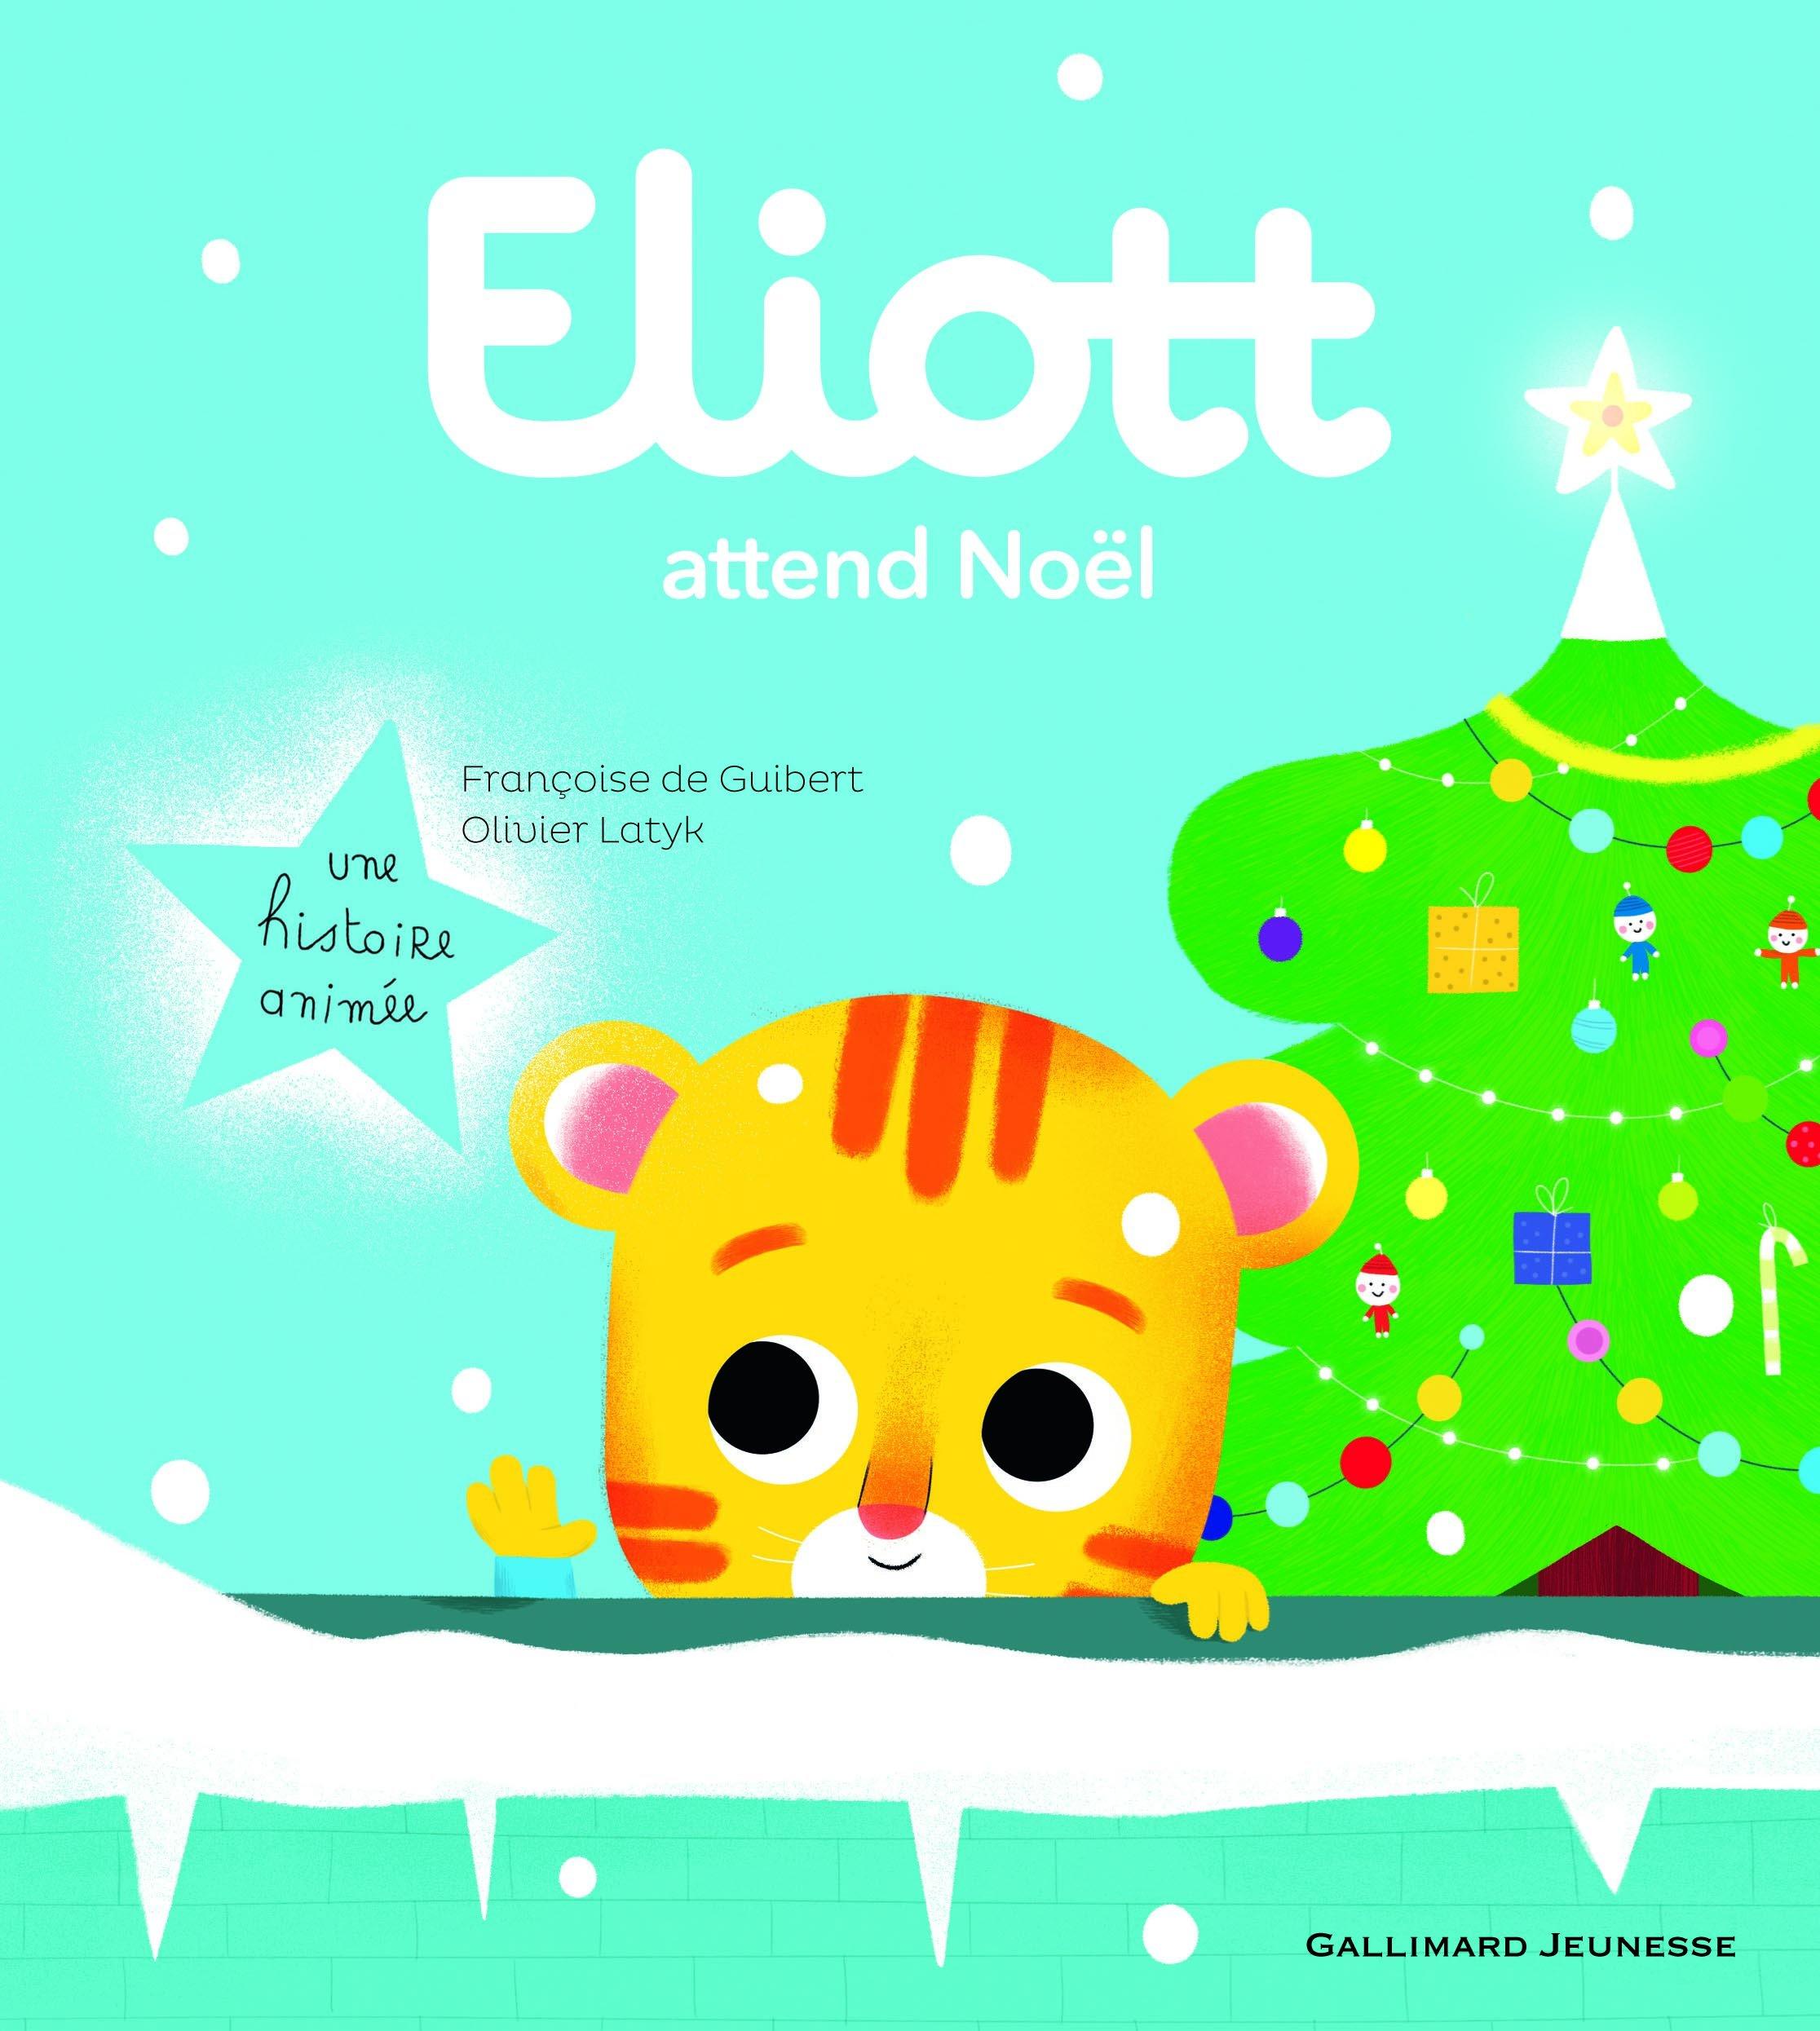 Eliott attend Noël